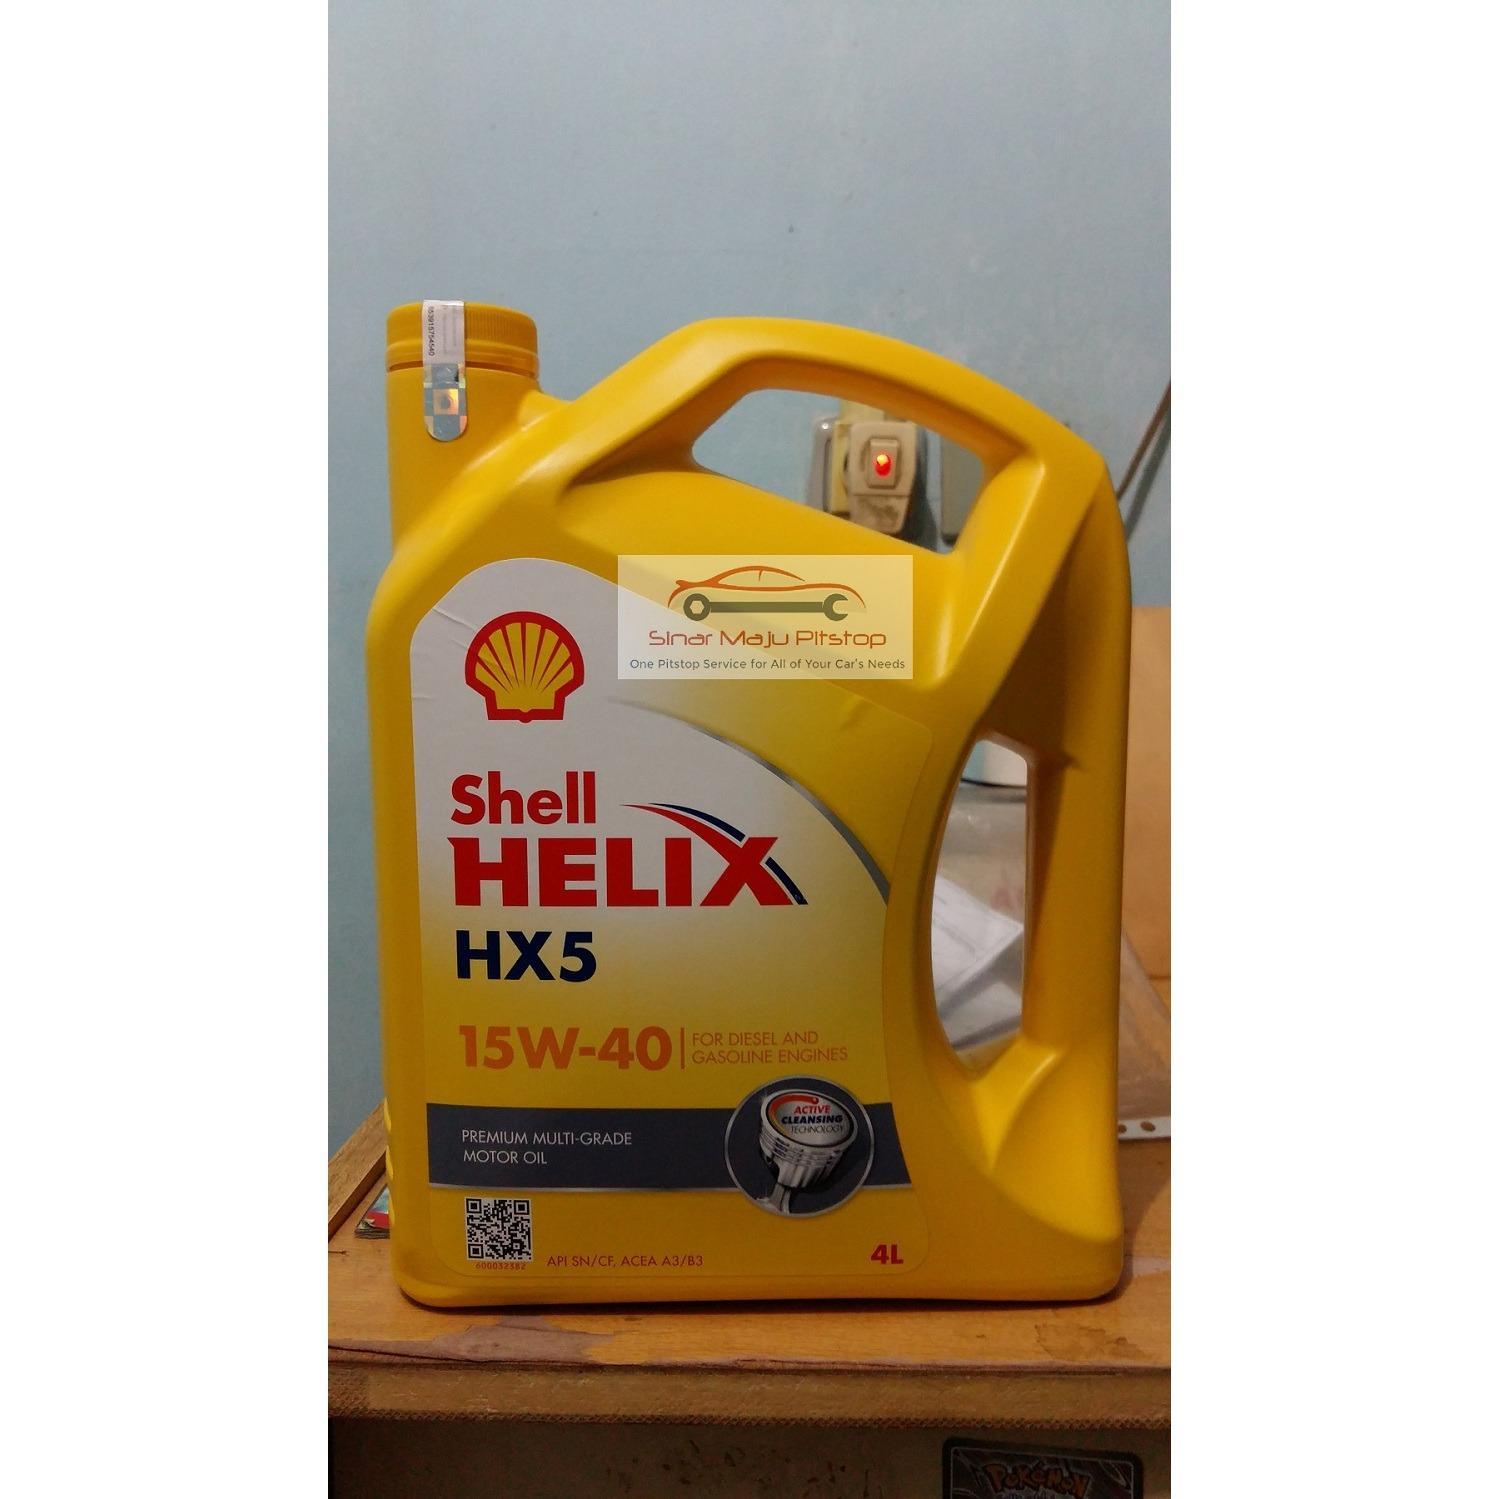 Shell Helix HX5 15W-40 API SN 4 Liter - Pelumas Oli Mesin Mobil Kemasan Baru Segel Hologram ORIGINAL - BISA DICEK KEASLIAN NYA DI WEBSITE AC SHELL COM